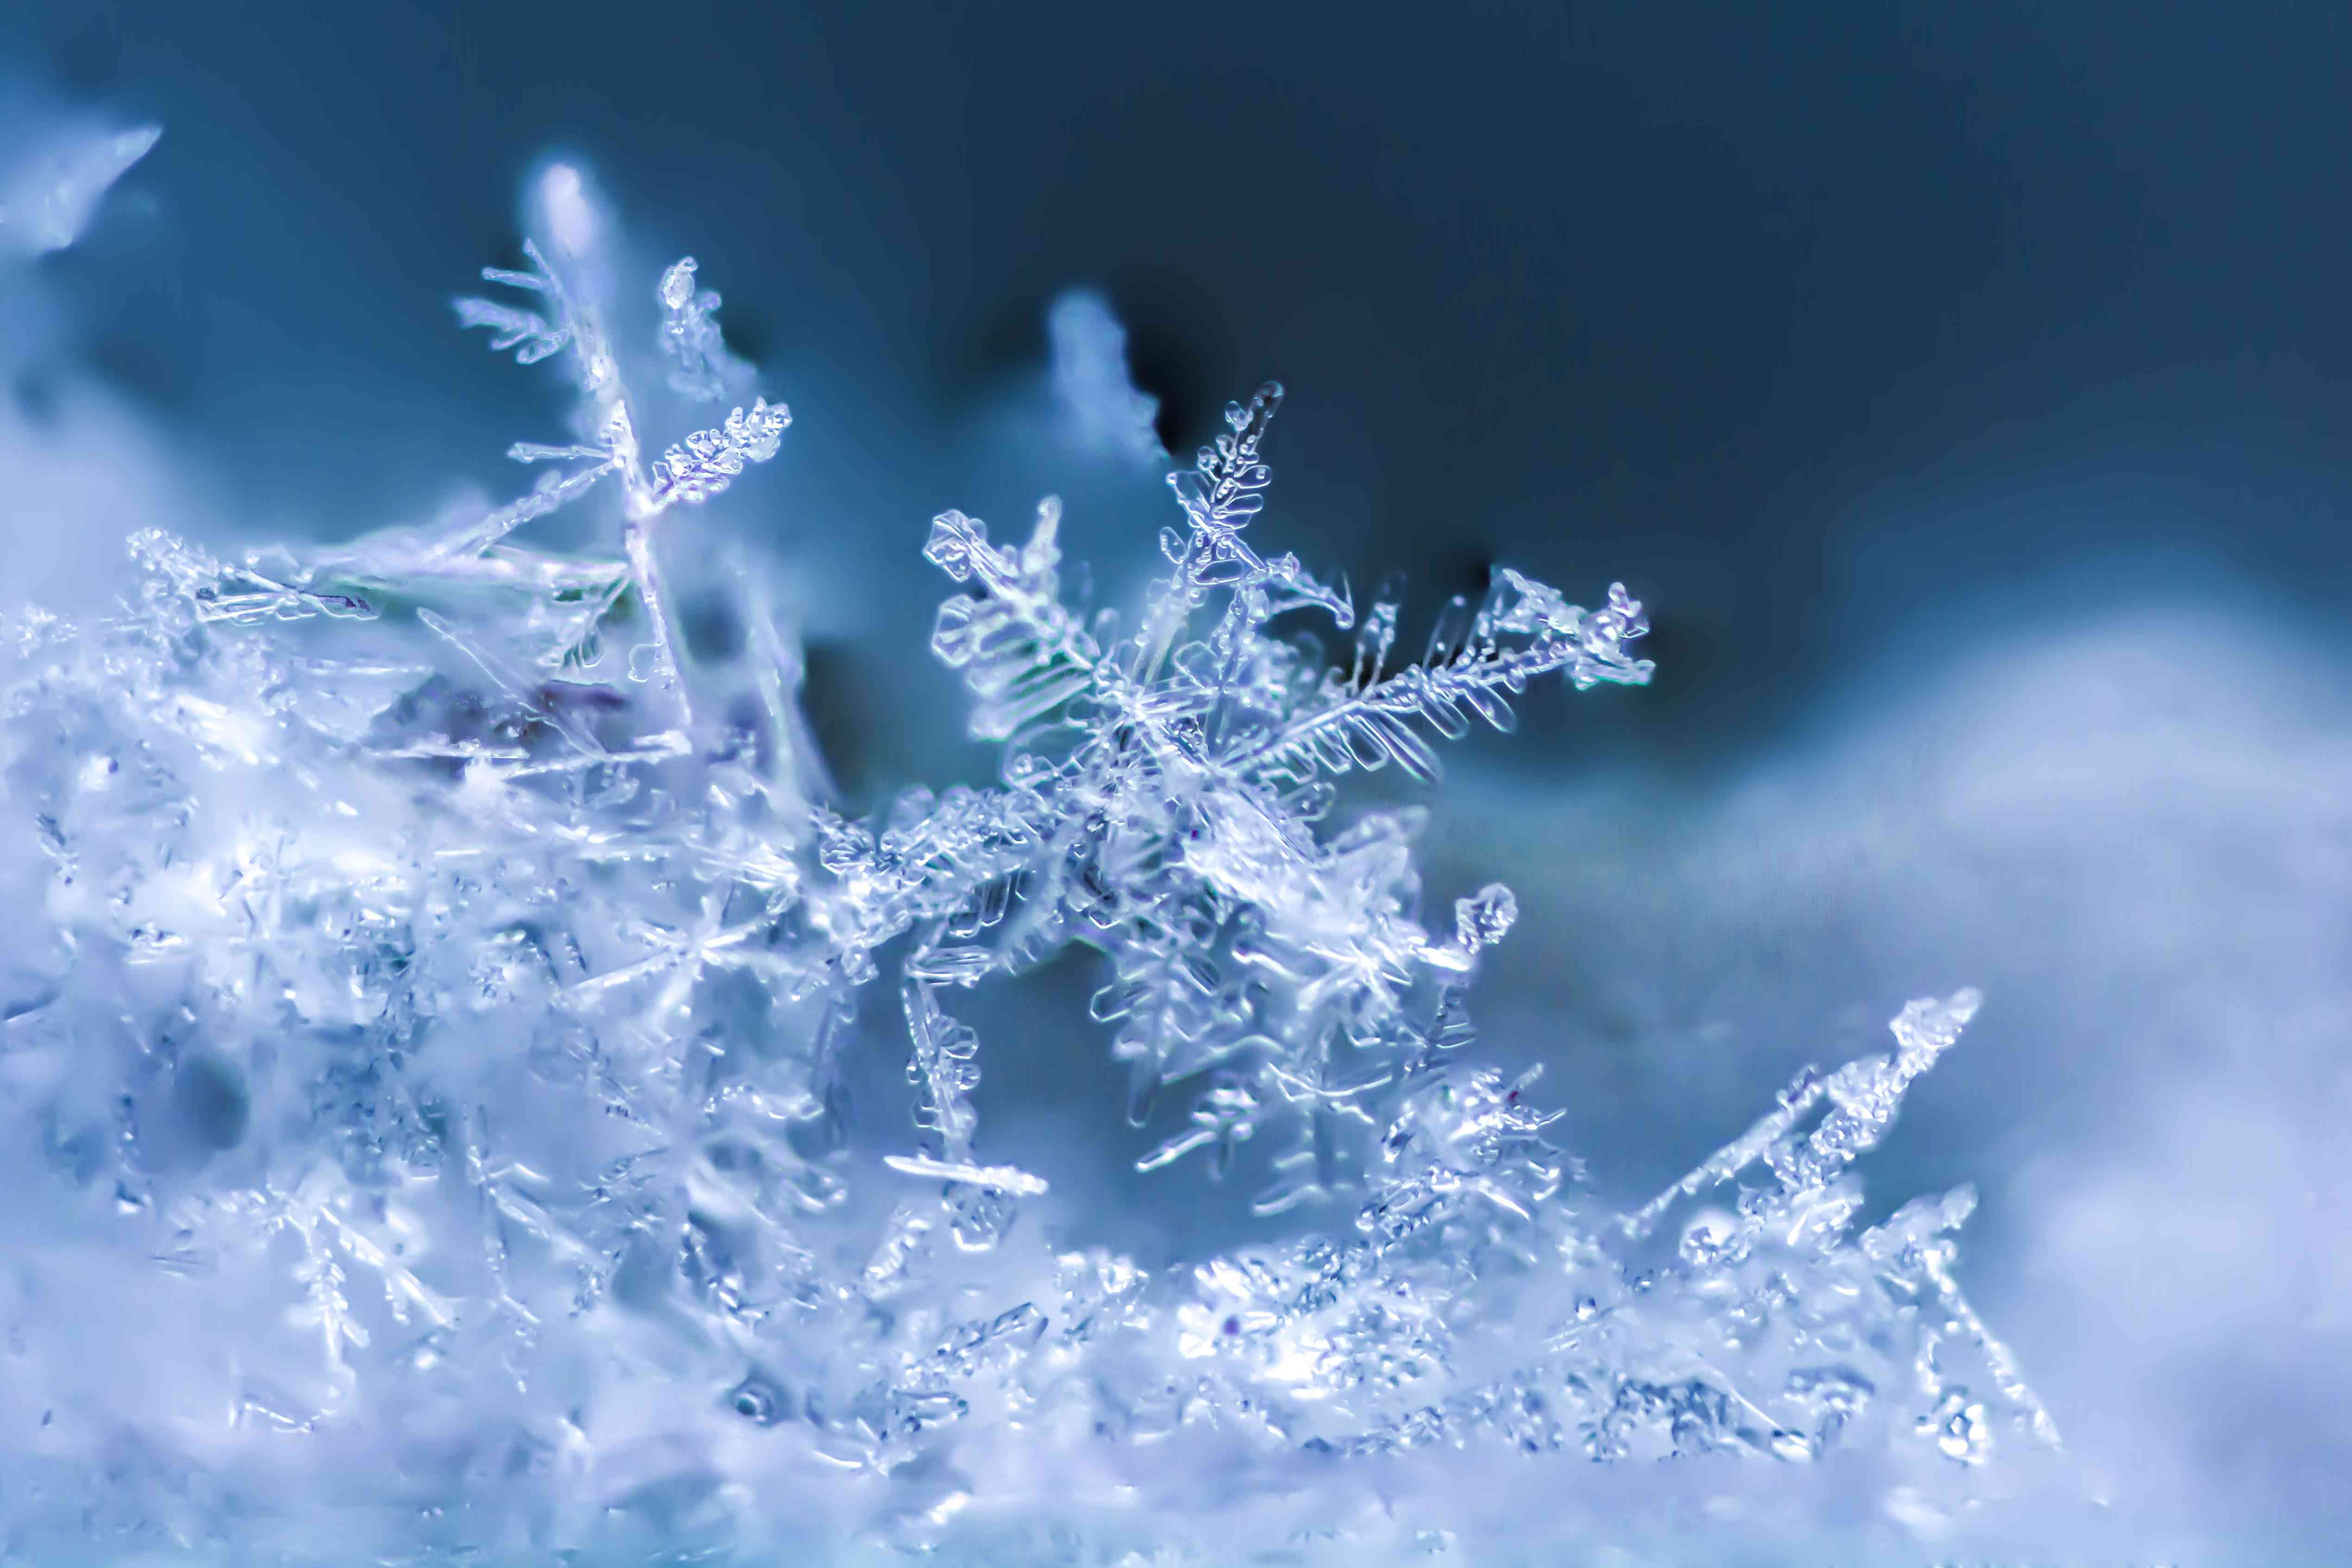 Snowflake pile-up